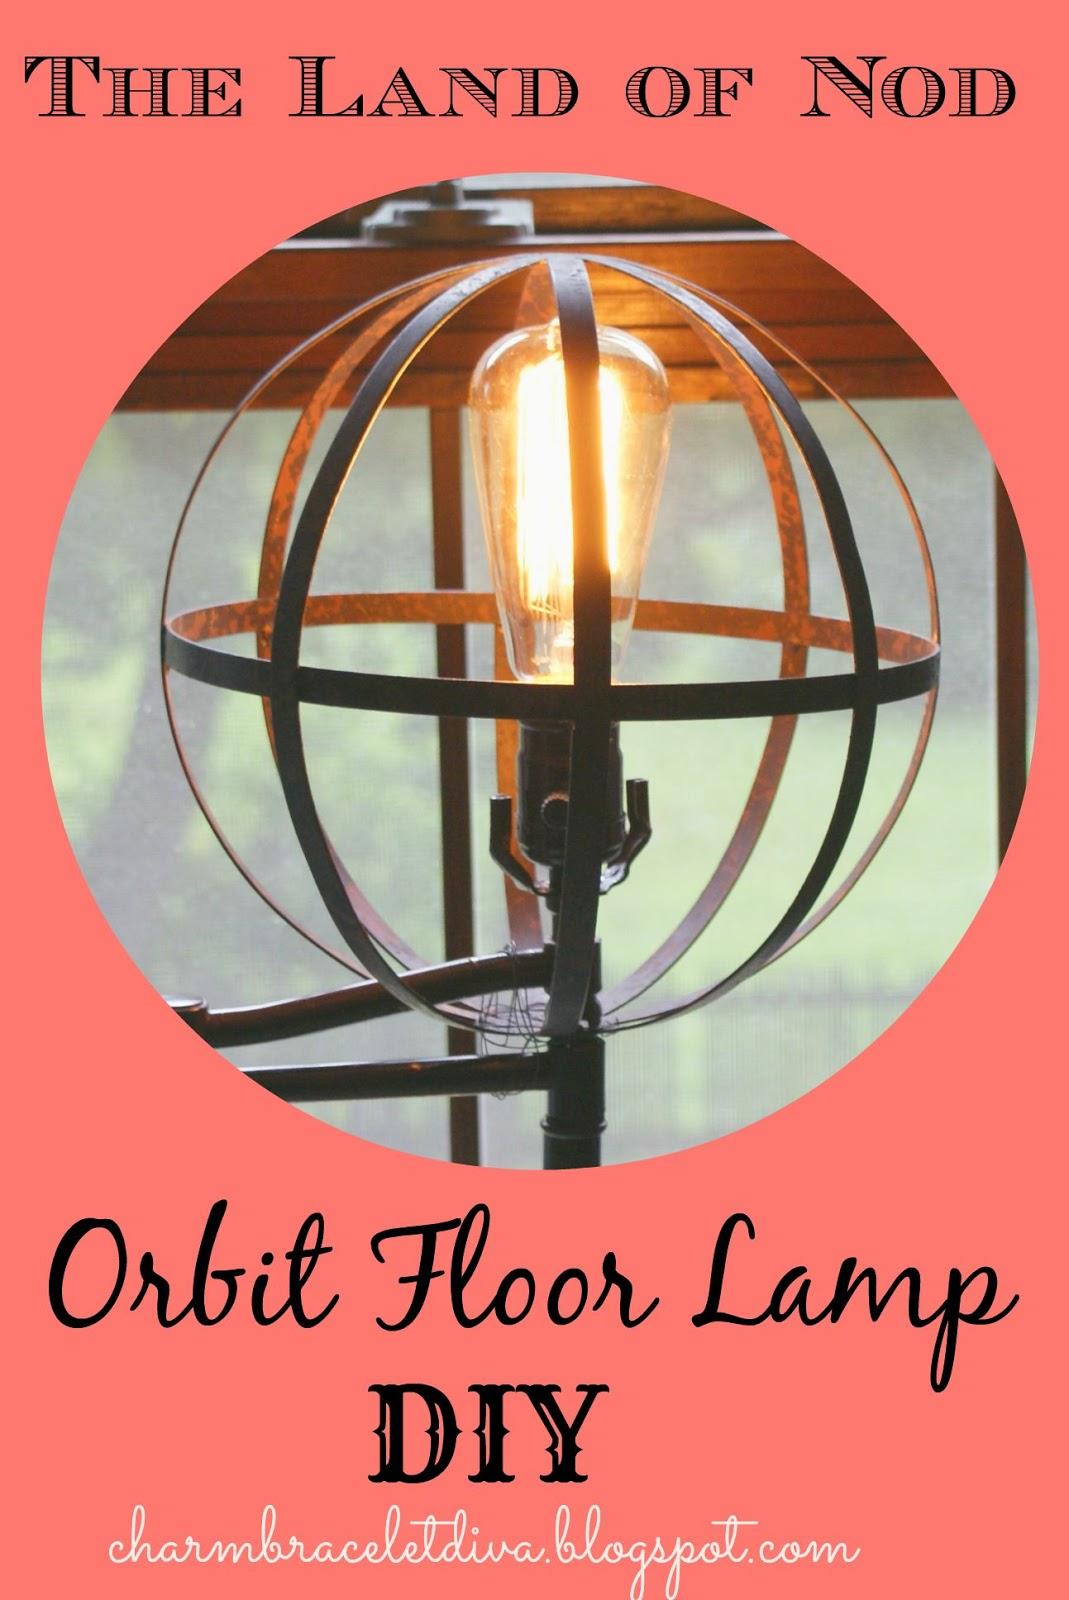 Our Hopeful Home: The Land of Nod-Inspired Orbital Floor Lamp DIY